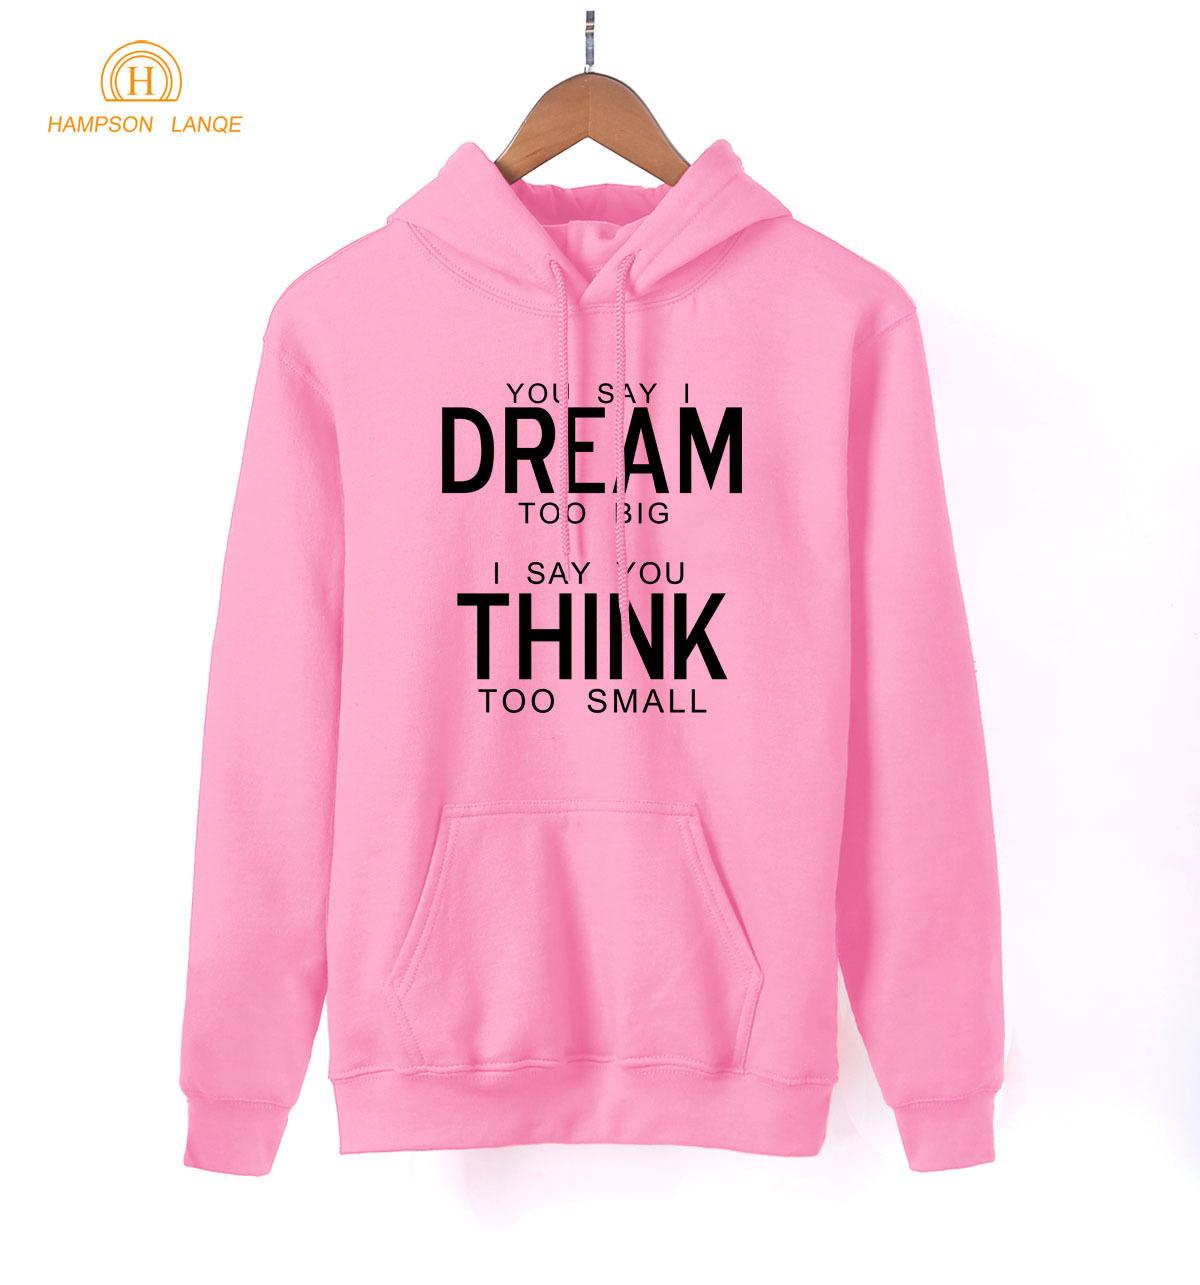 You Say I Dream Too Big I Say You Think Too Small Funny Hoodies Lady 2019 Spring Autumn Kawaii Pink Sweatshirts K-pop Pullovers